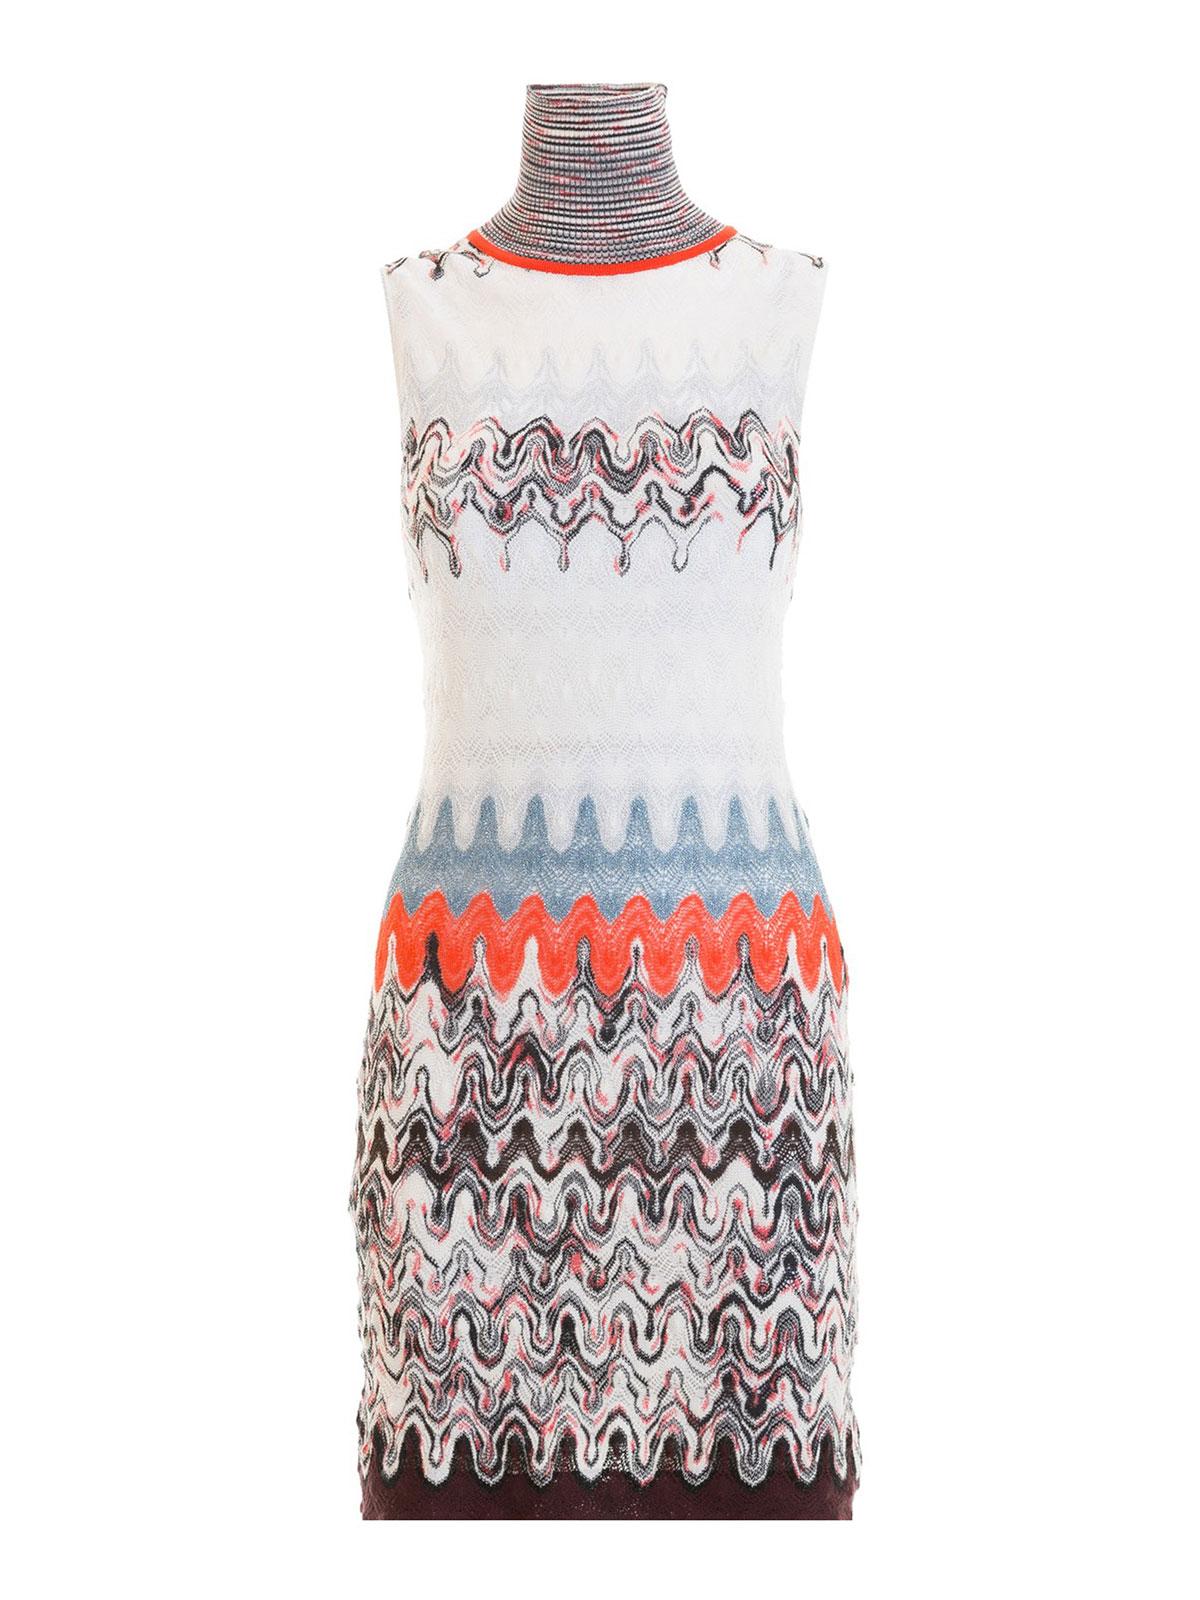 b06897f7820f7 Missoni - Vestido Corto - Multicolor - Vestidos cortos ...